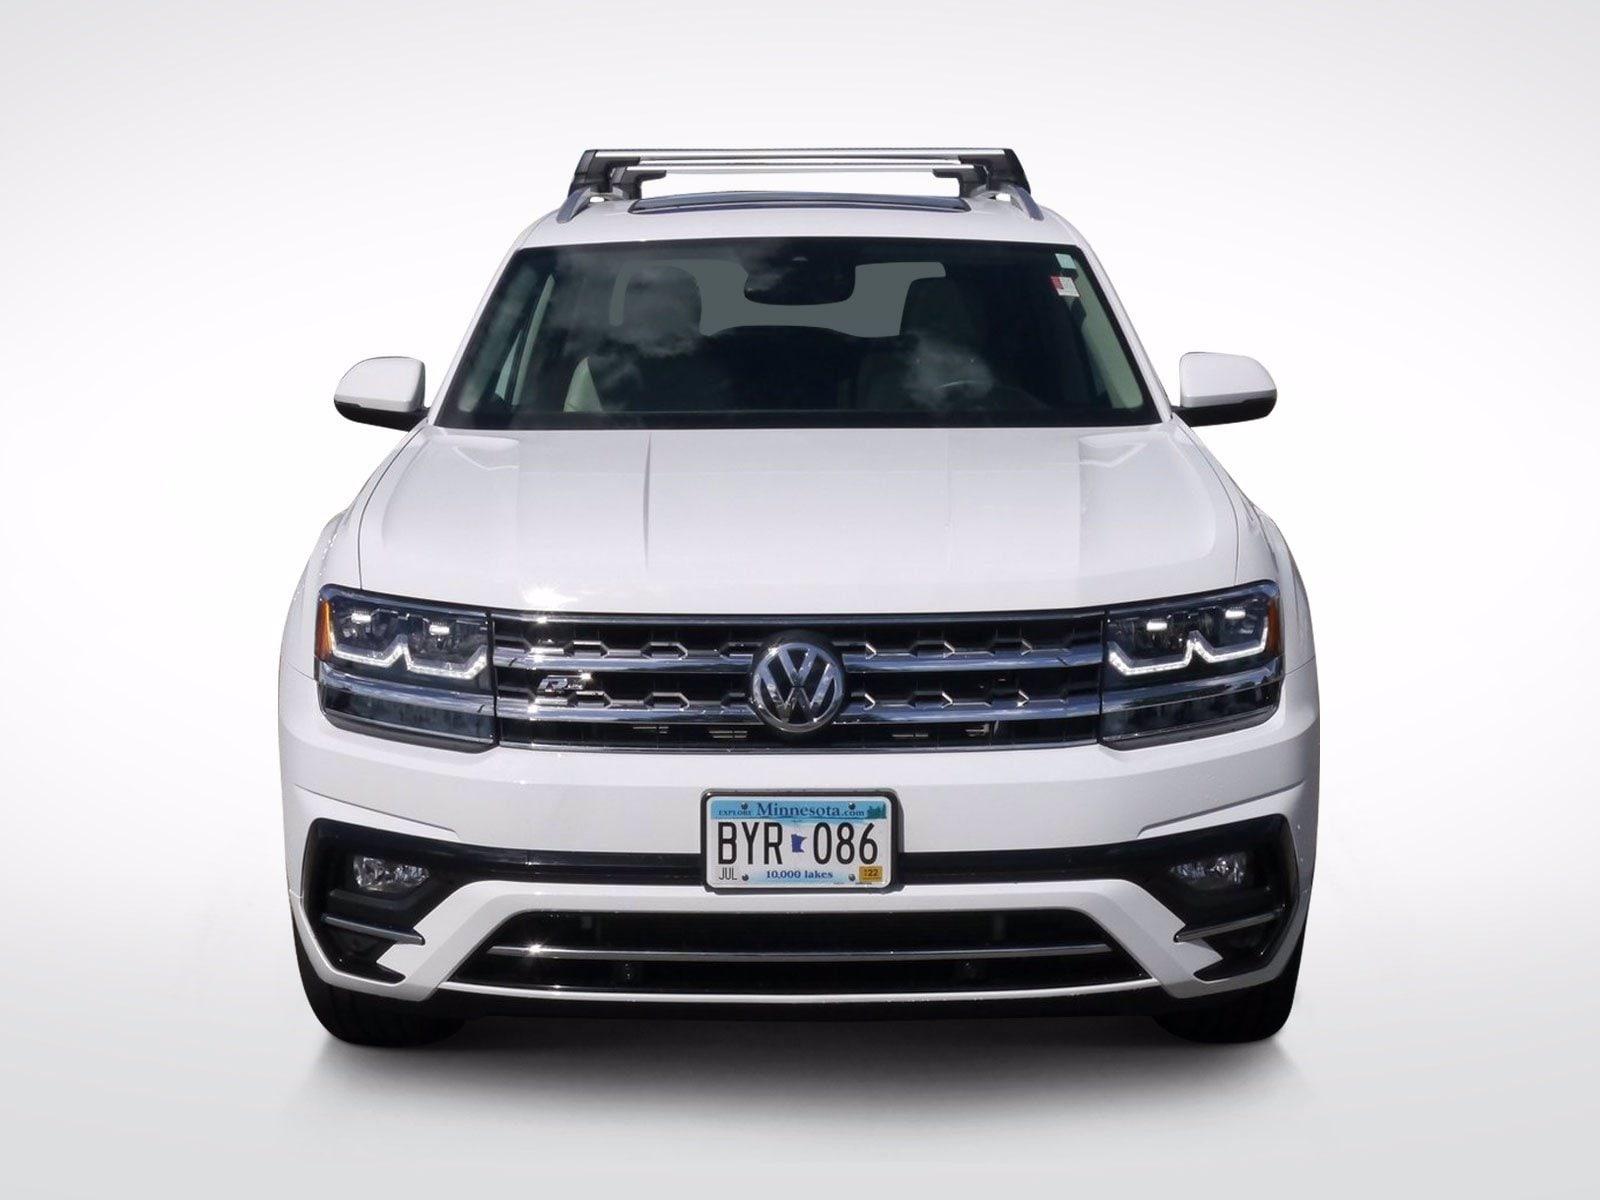 Used 2018 Volkswagen Atlas SEL with VIN 1V2RR2CA6JC584447 for sale in Baxter, Minnesota